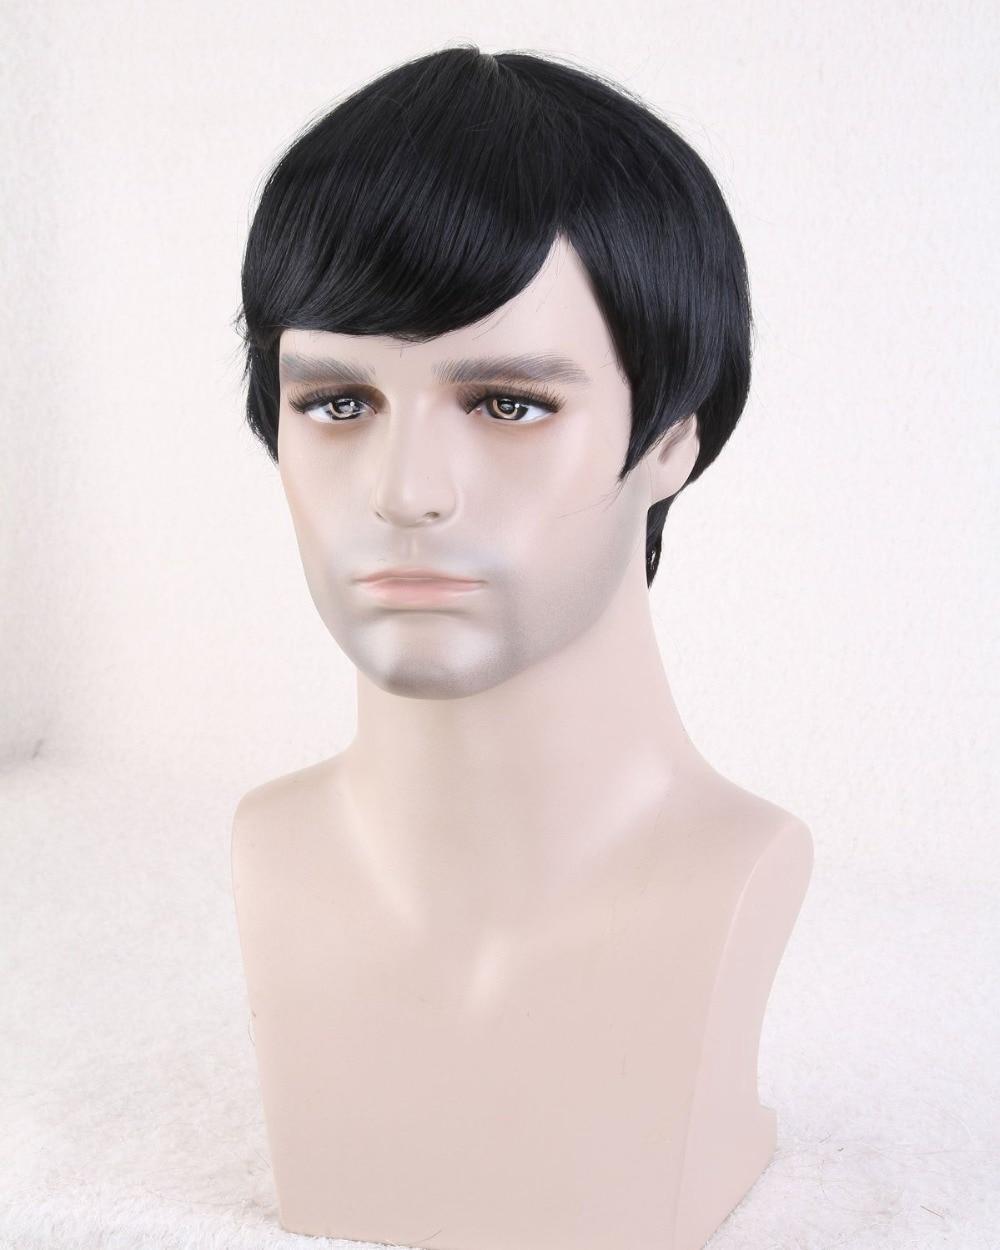 tipos de cabello, pelo sintetico